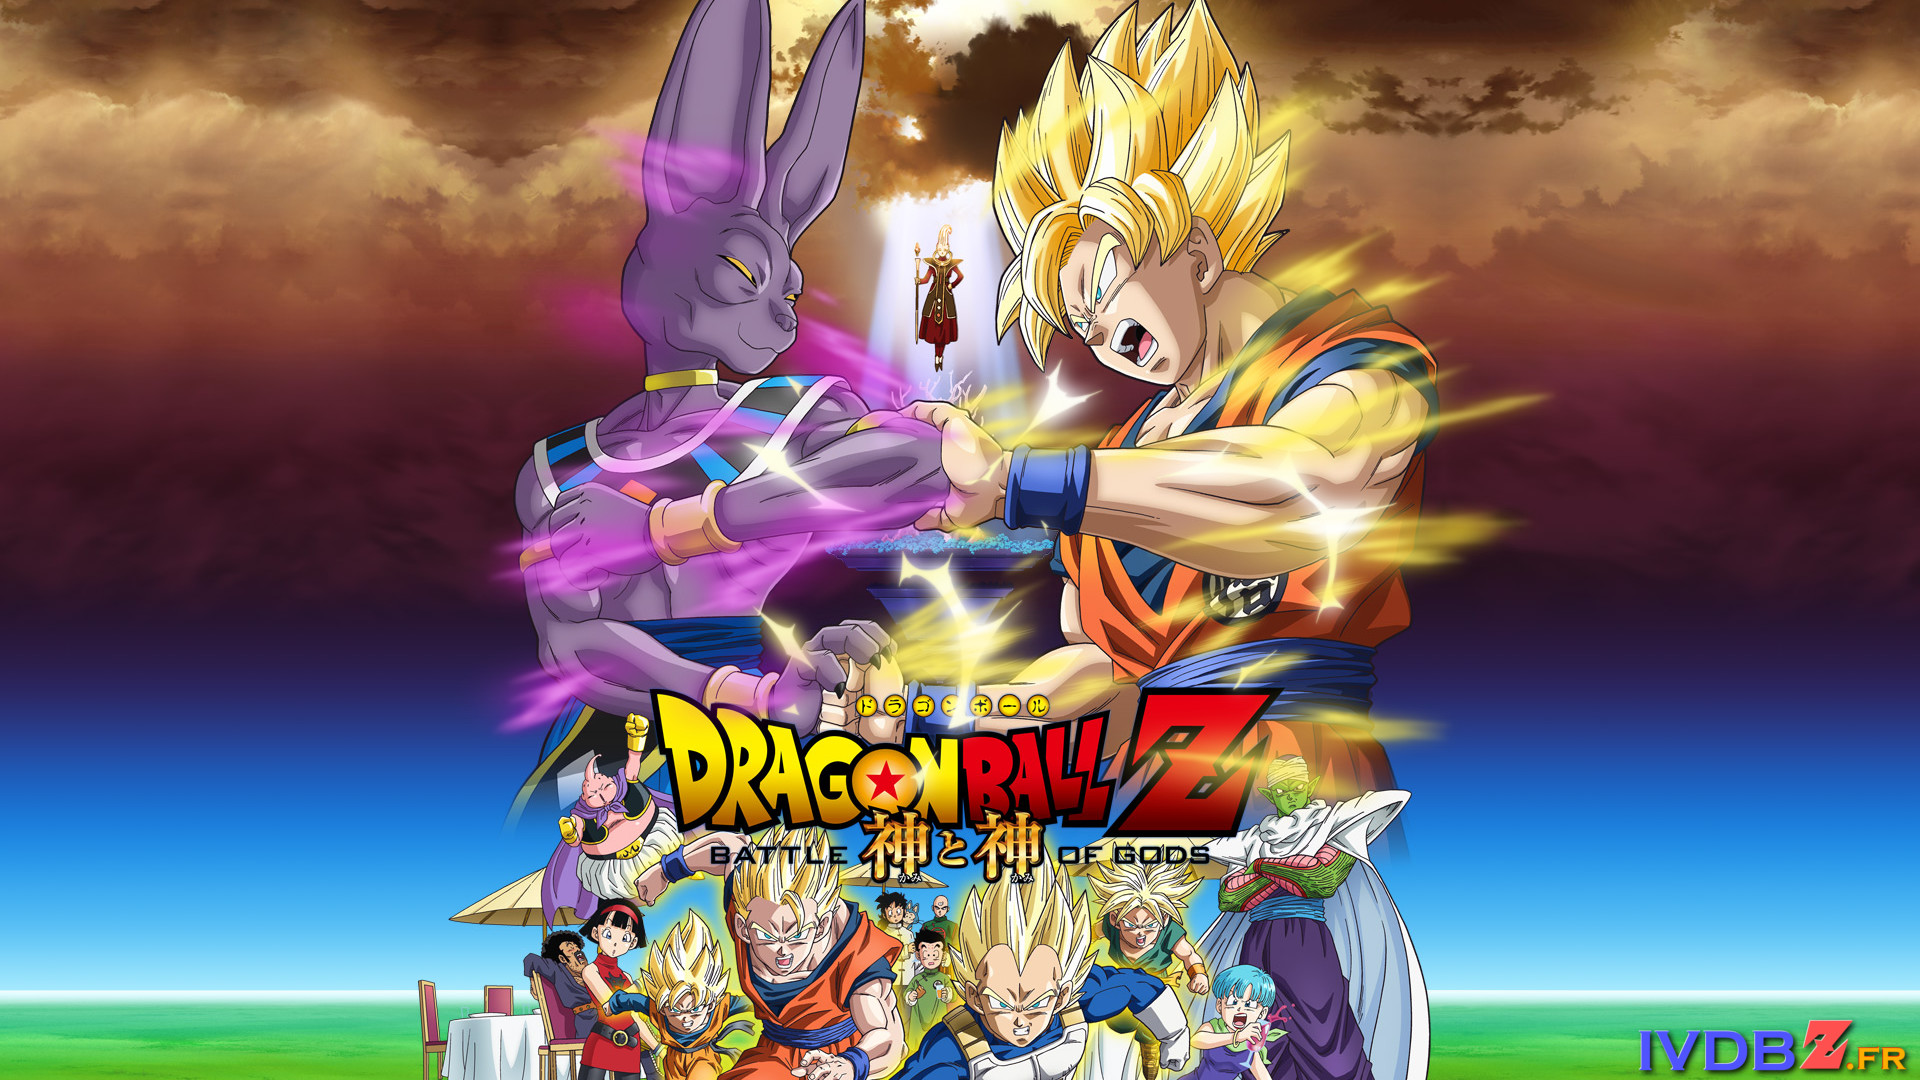 4 Dragon Ball Z: Battle of Gods HD Wallpapers | Backgrounds – Wallpaper  Abyss